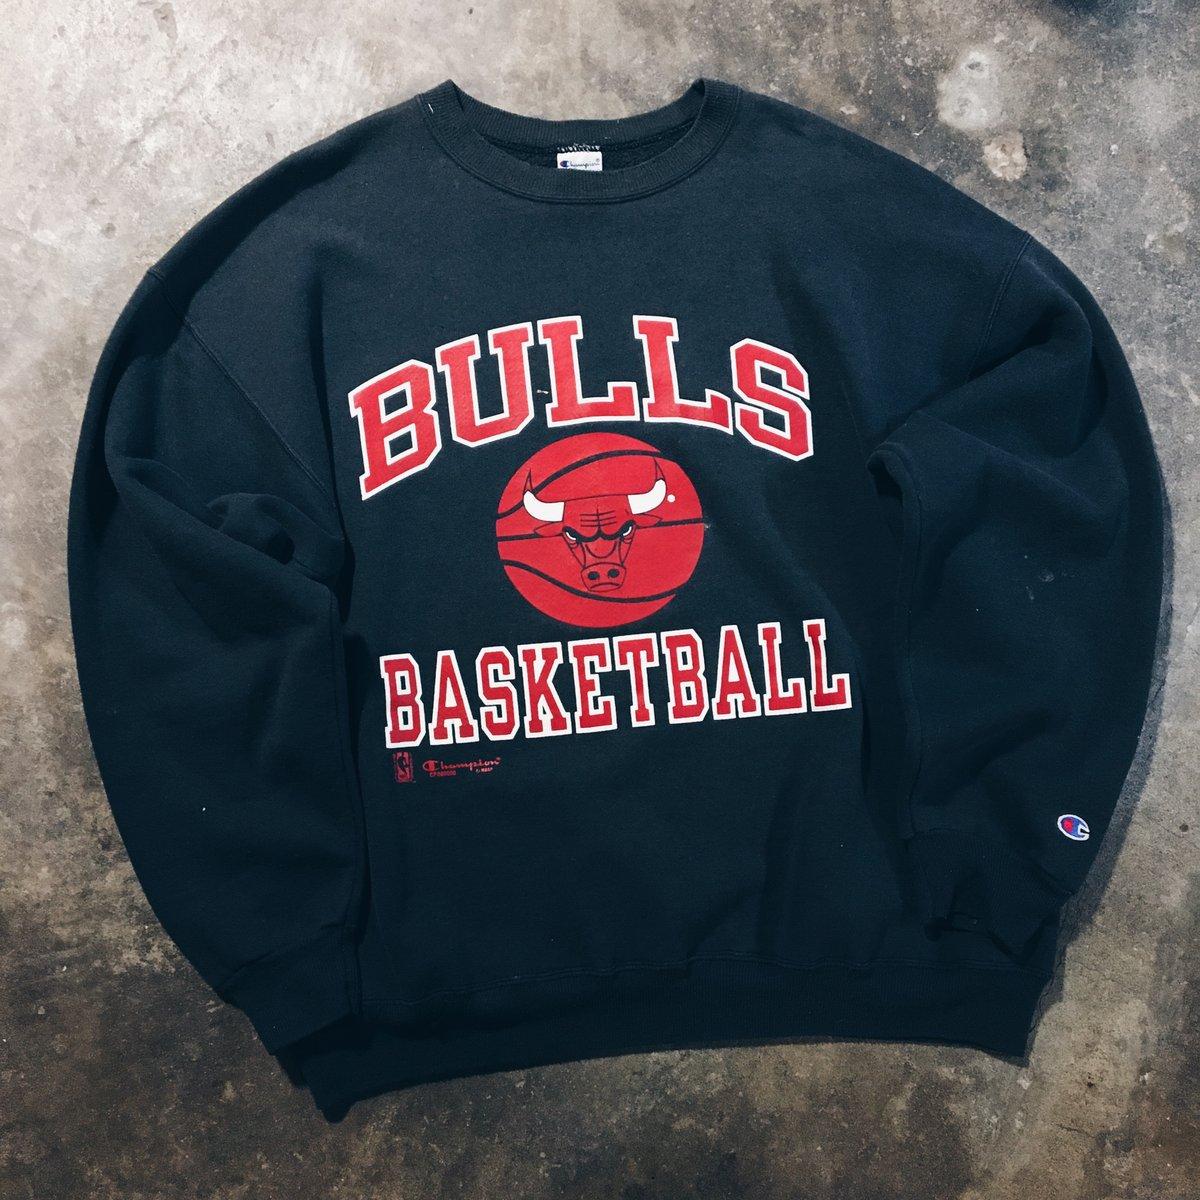 Image of Original 90's Made In USA Champion Chicago Bulls Crewneck Sweatshirt.